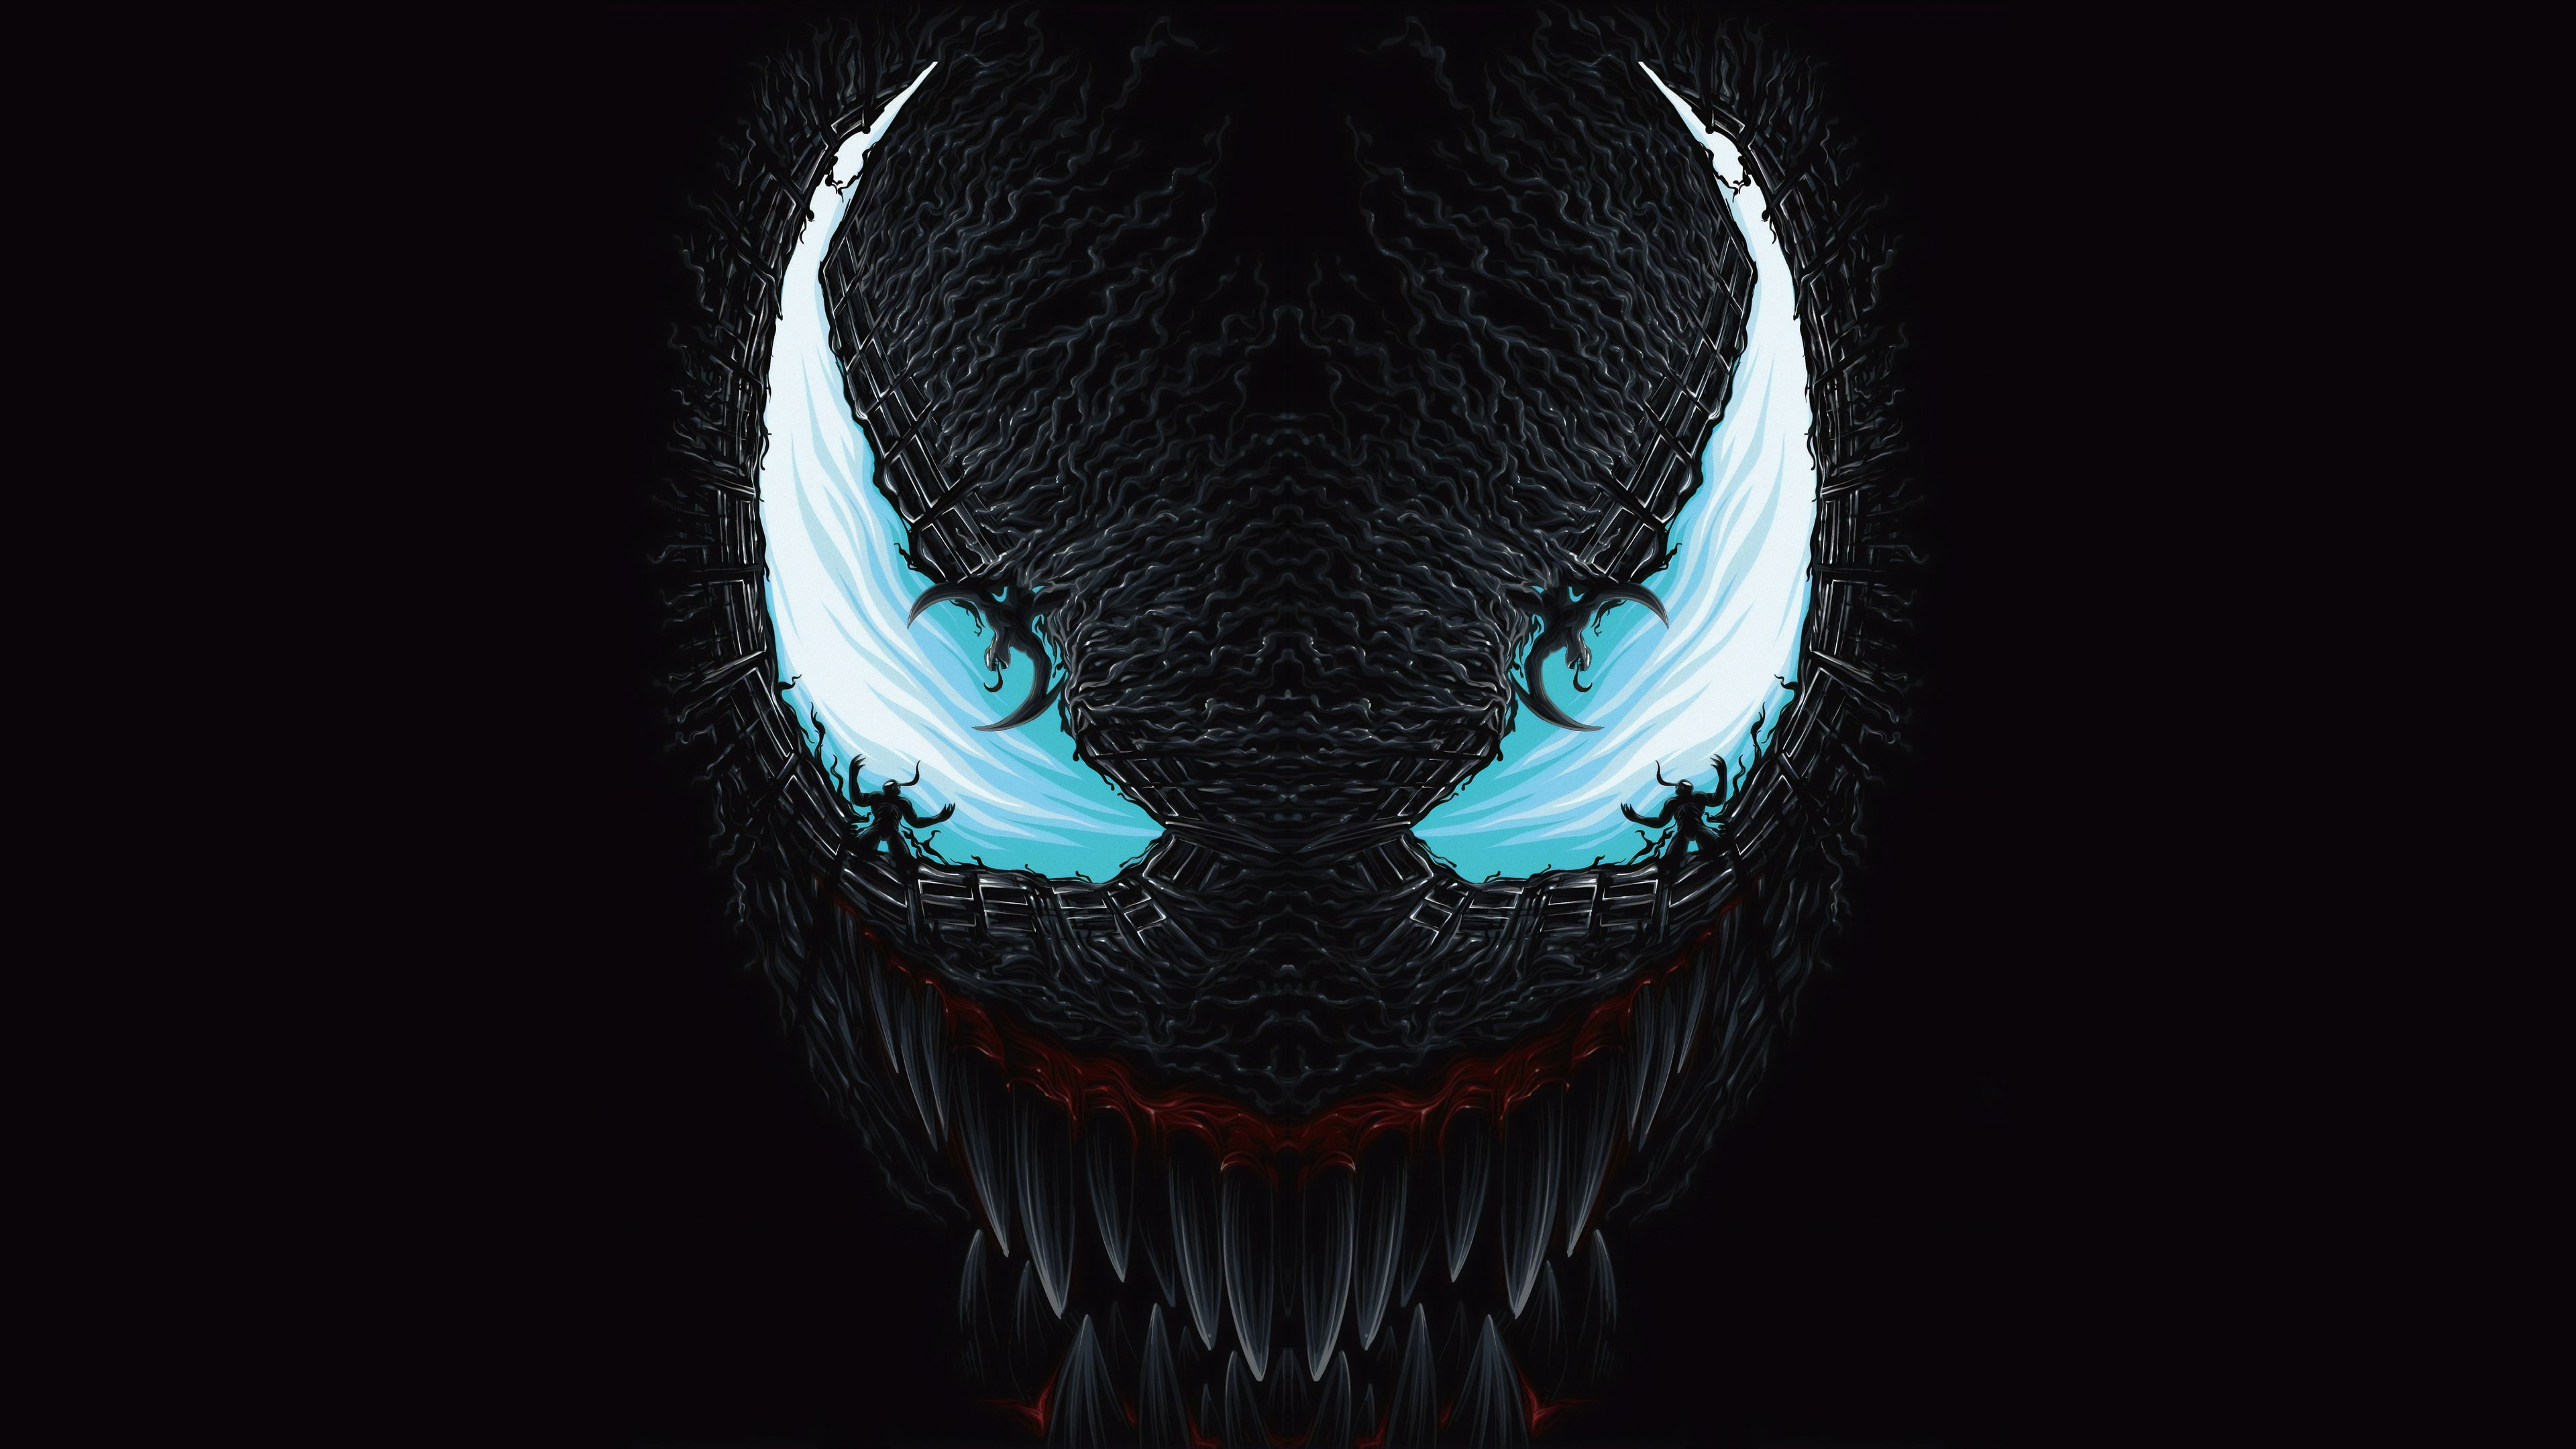 4k Venom Art Blue Venom wallpapers superheroes wallpapers hd 3840x2160